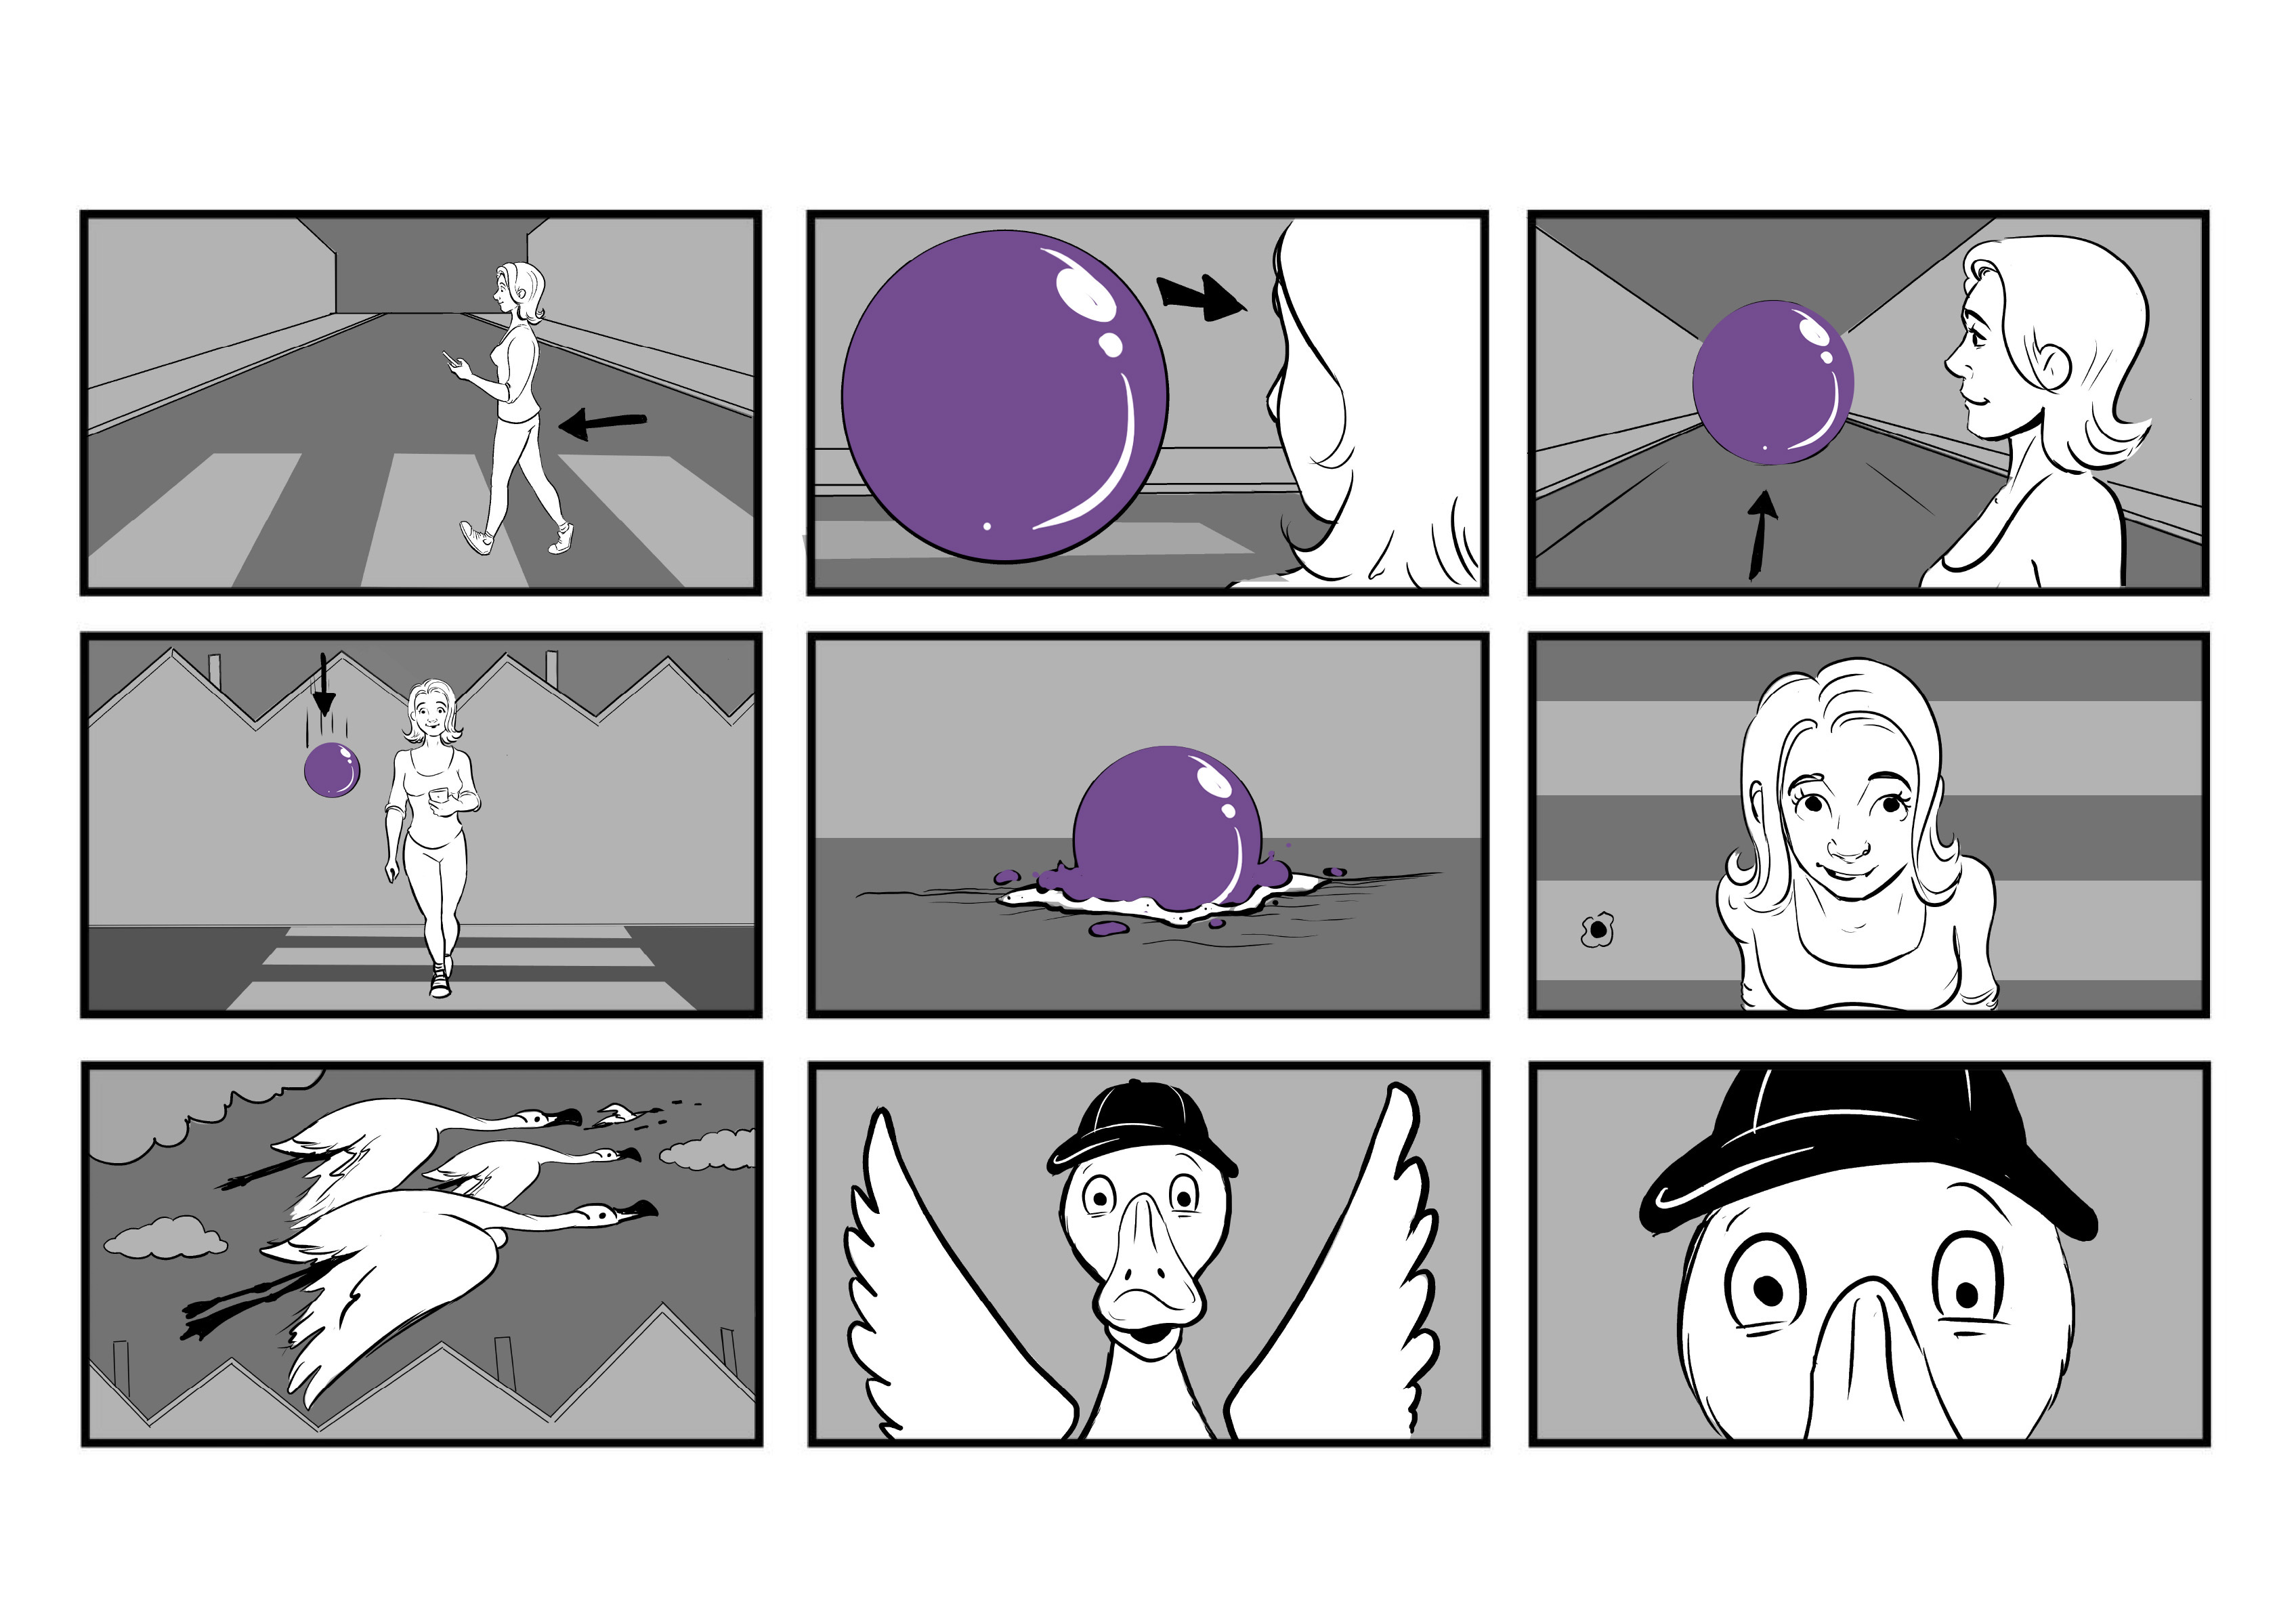 Ribena_Doodle_storyboards_v2-2